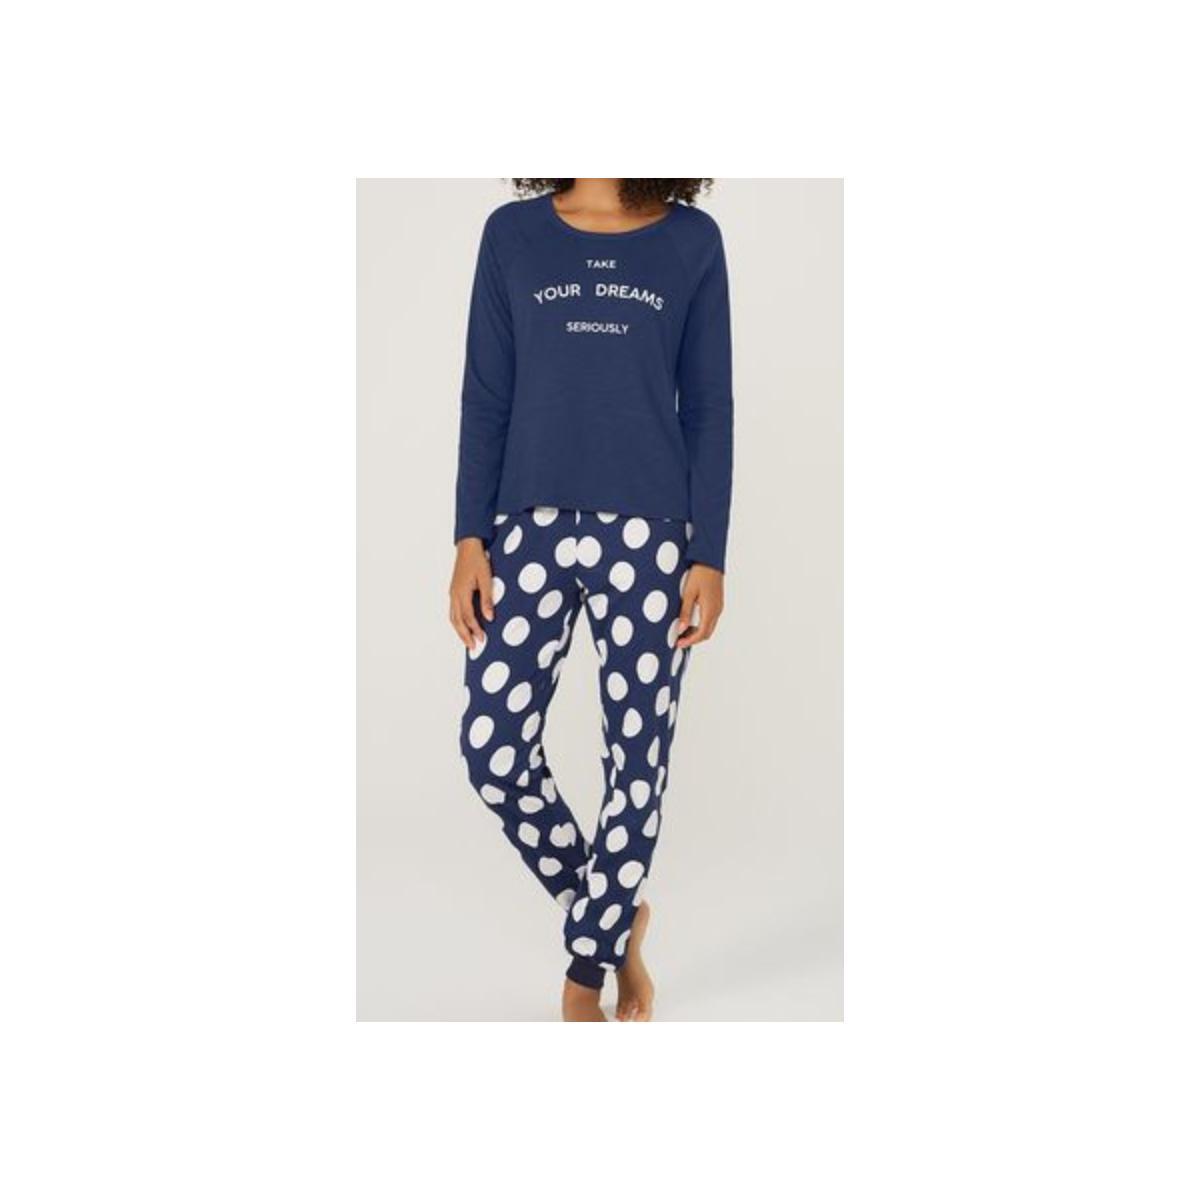 Pijama Feminina Hering 7byn 1den Marinho/branco